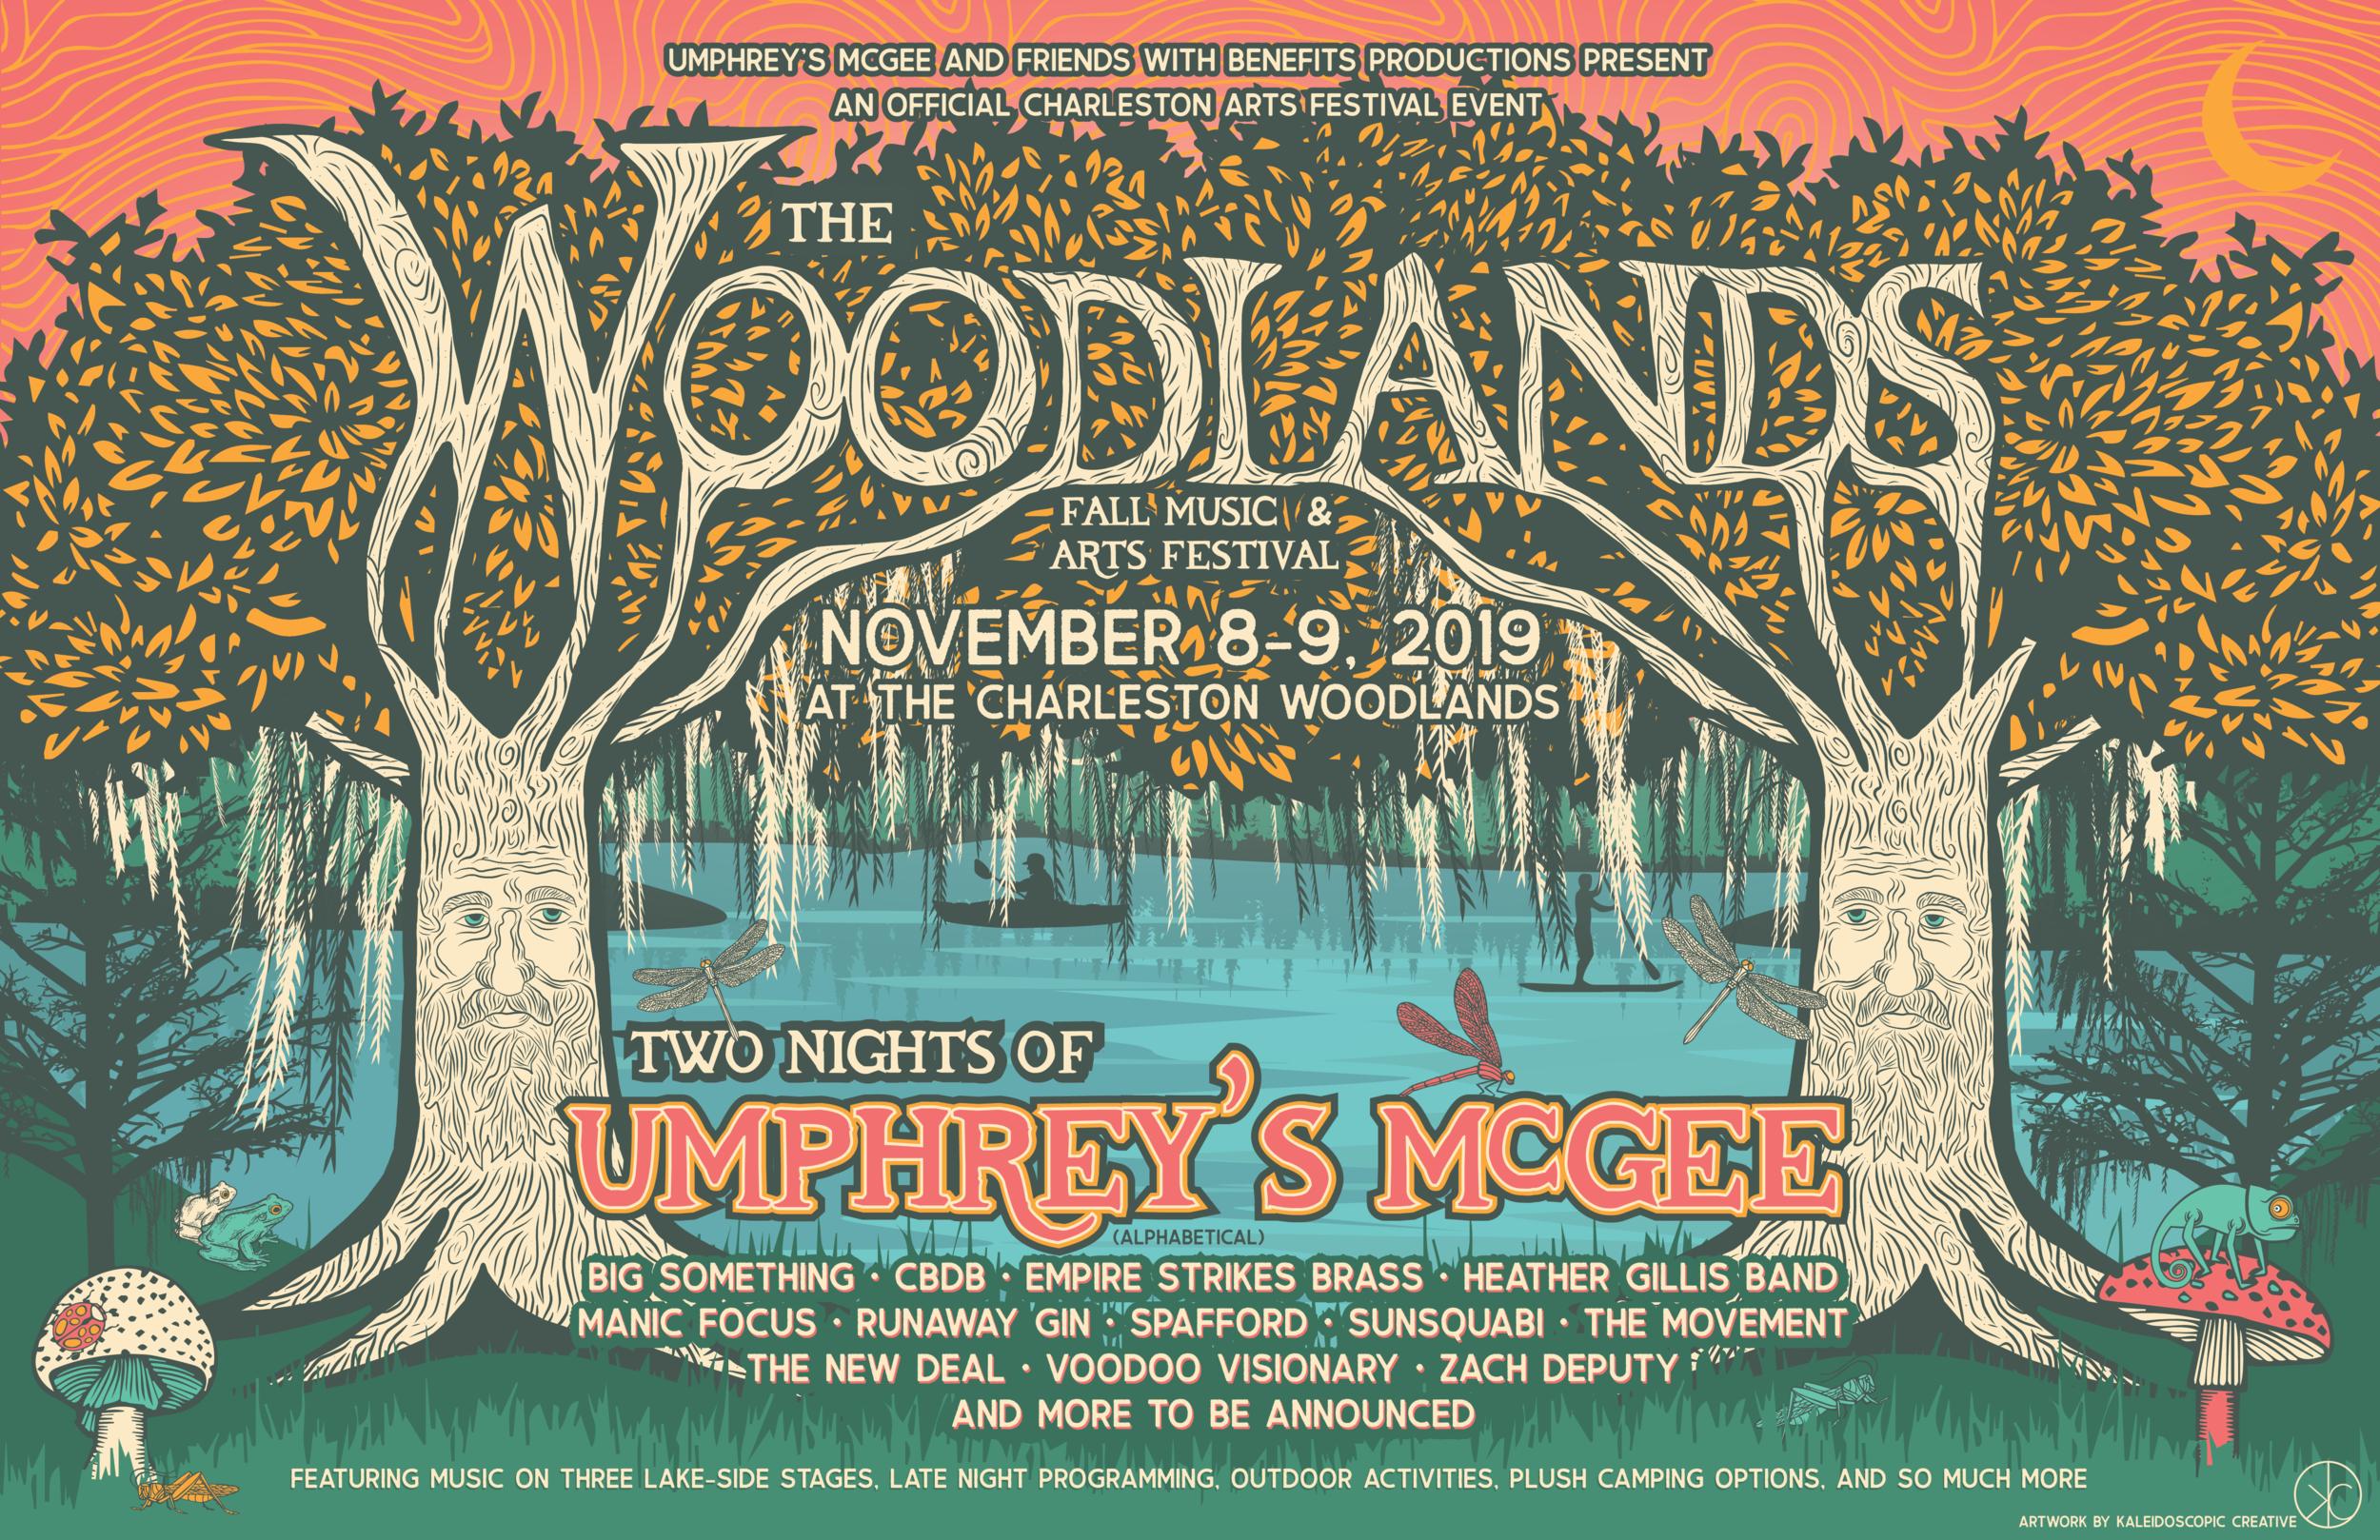 Woodlands-11x17-01.png